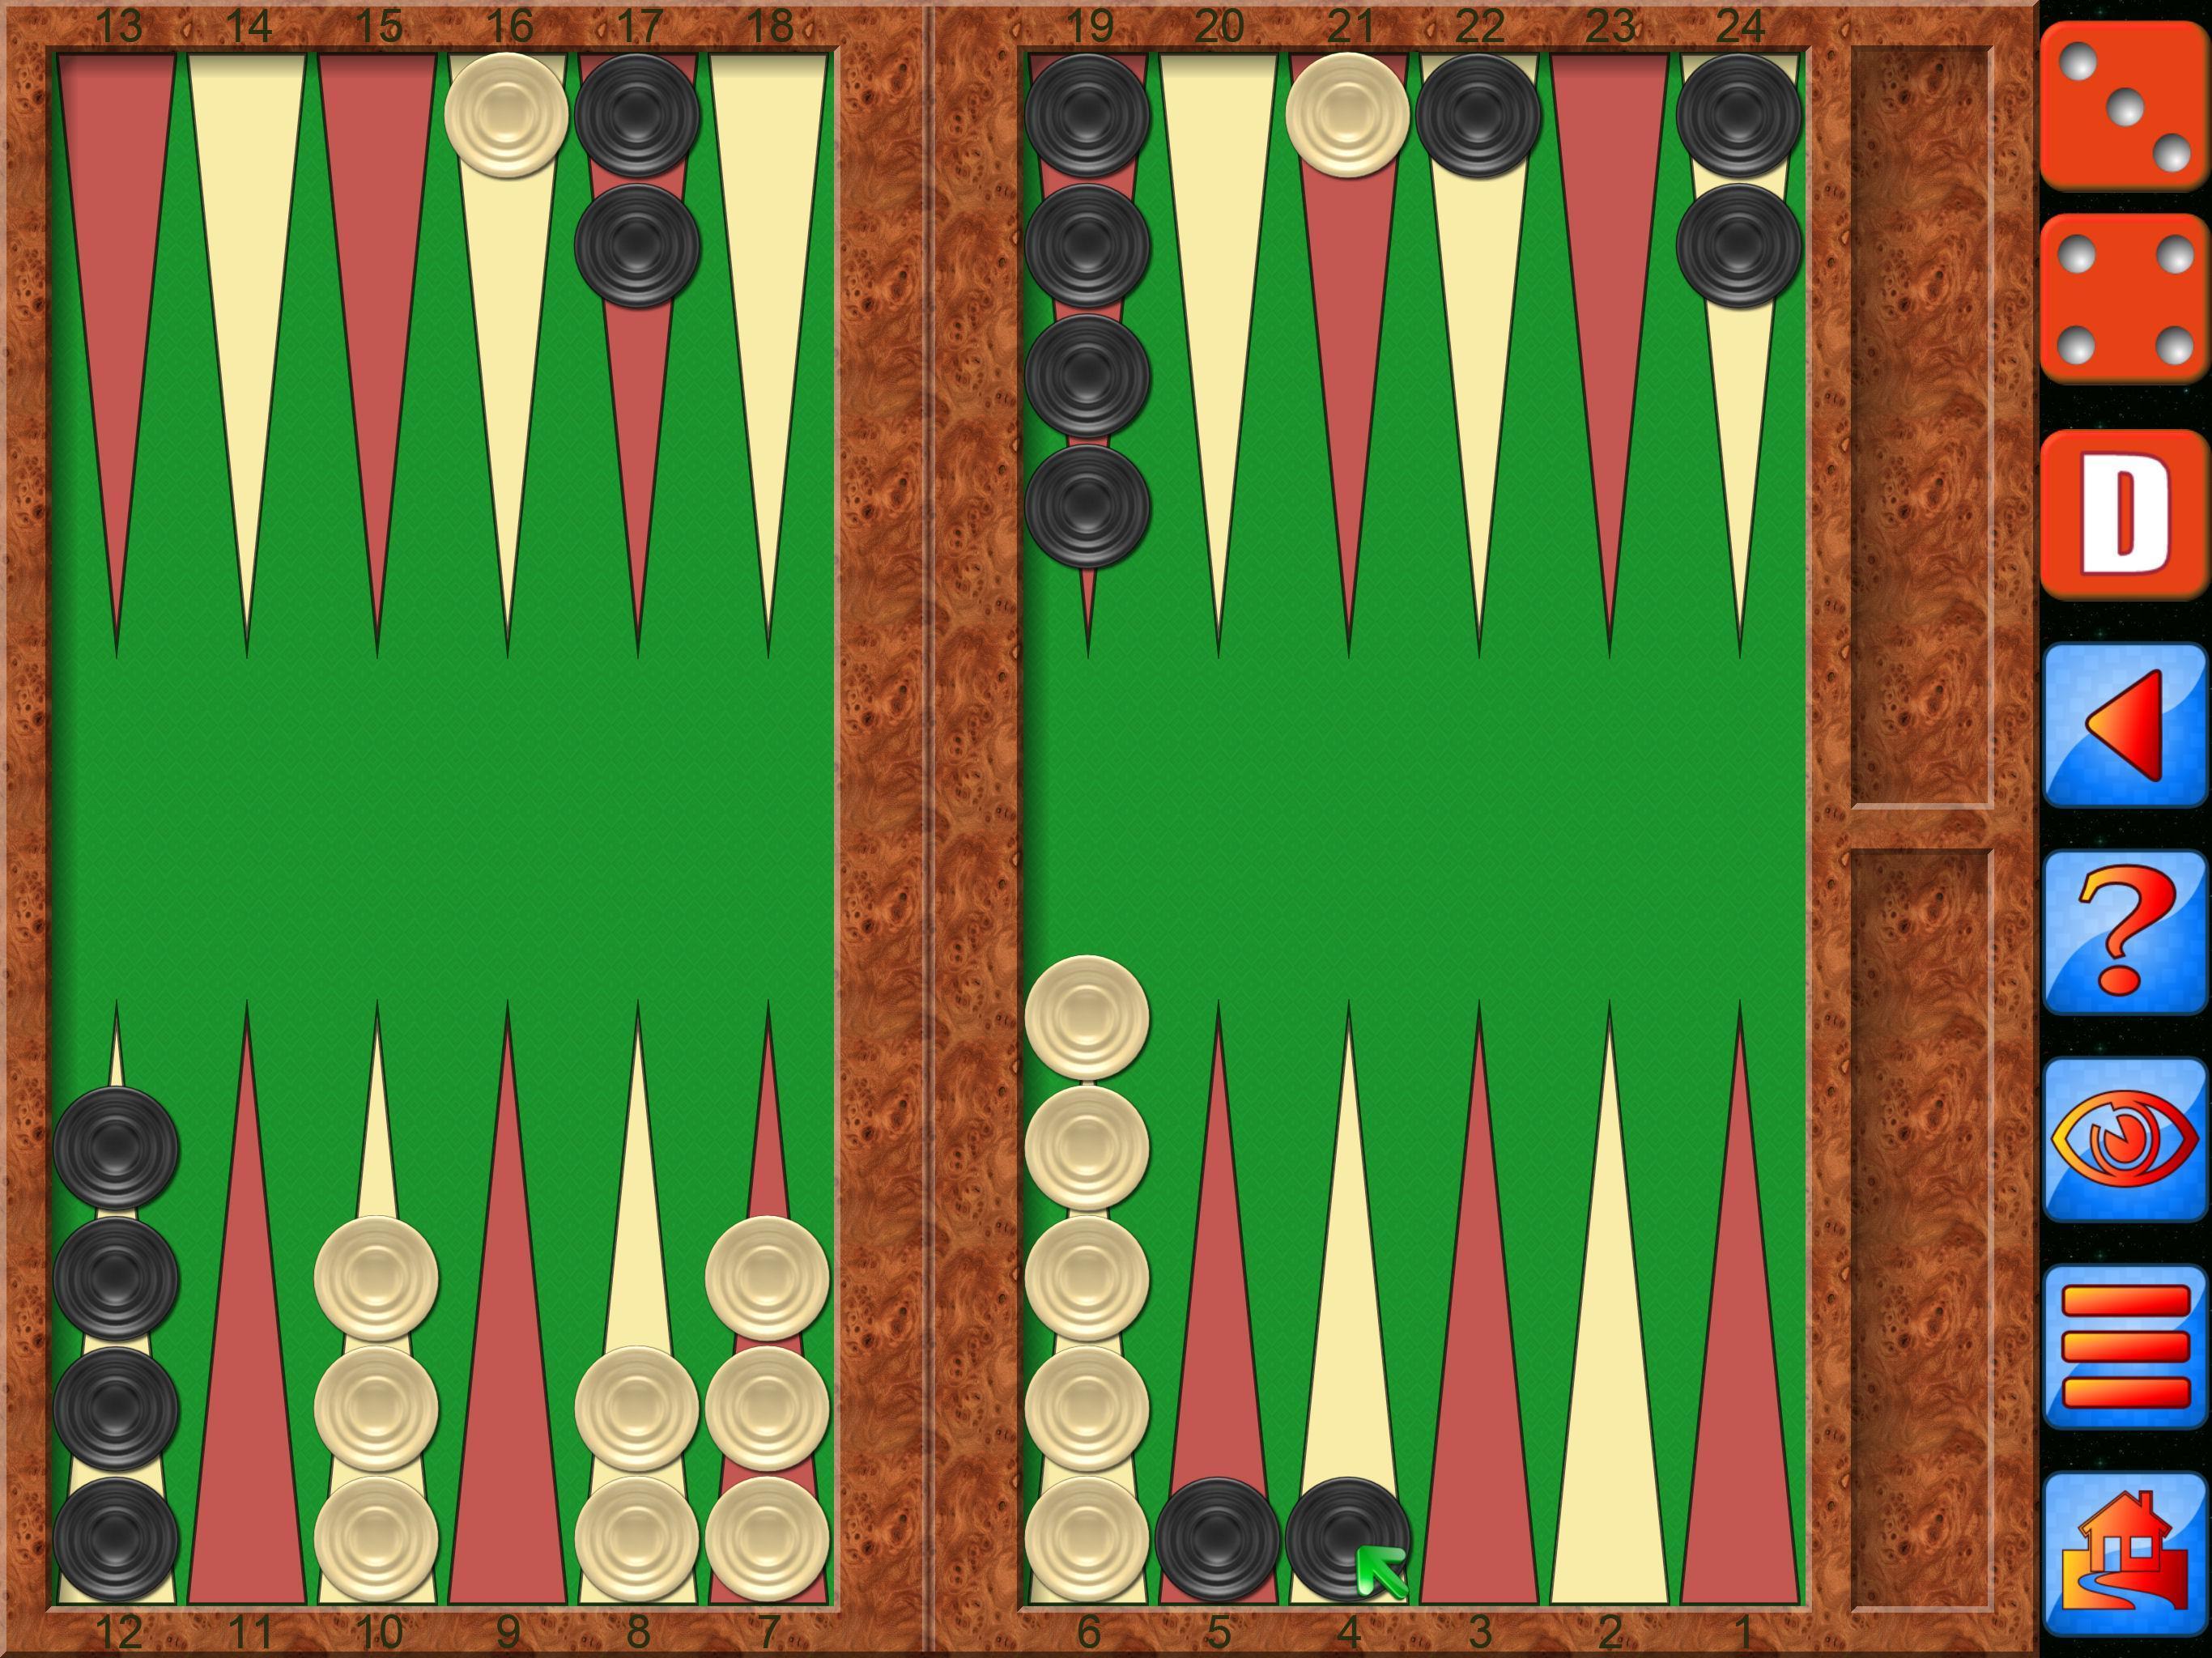 Backgammon V+, online multiplayer backgammon 5.25.64 Screenshot 6